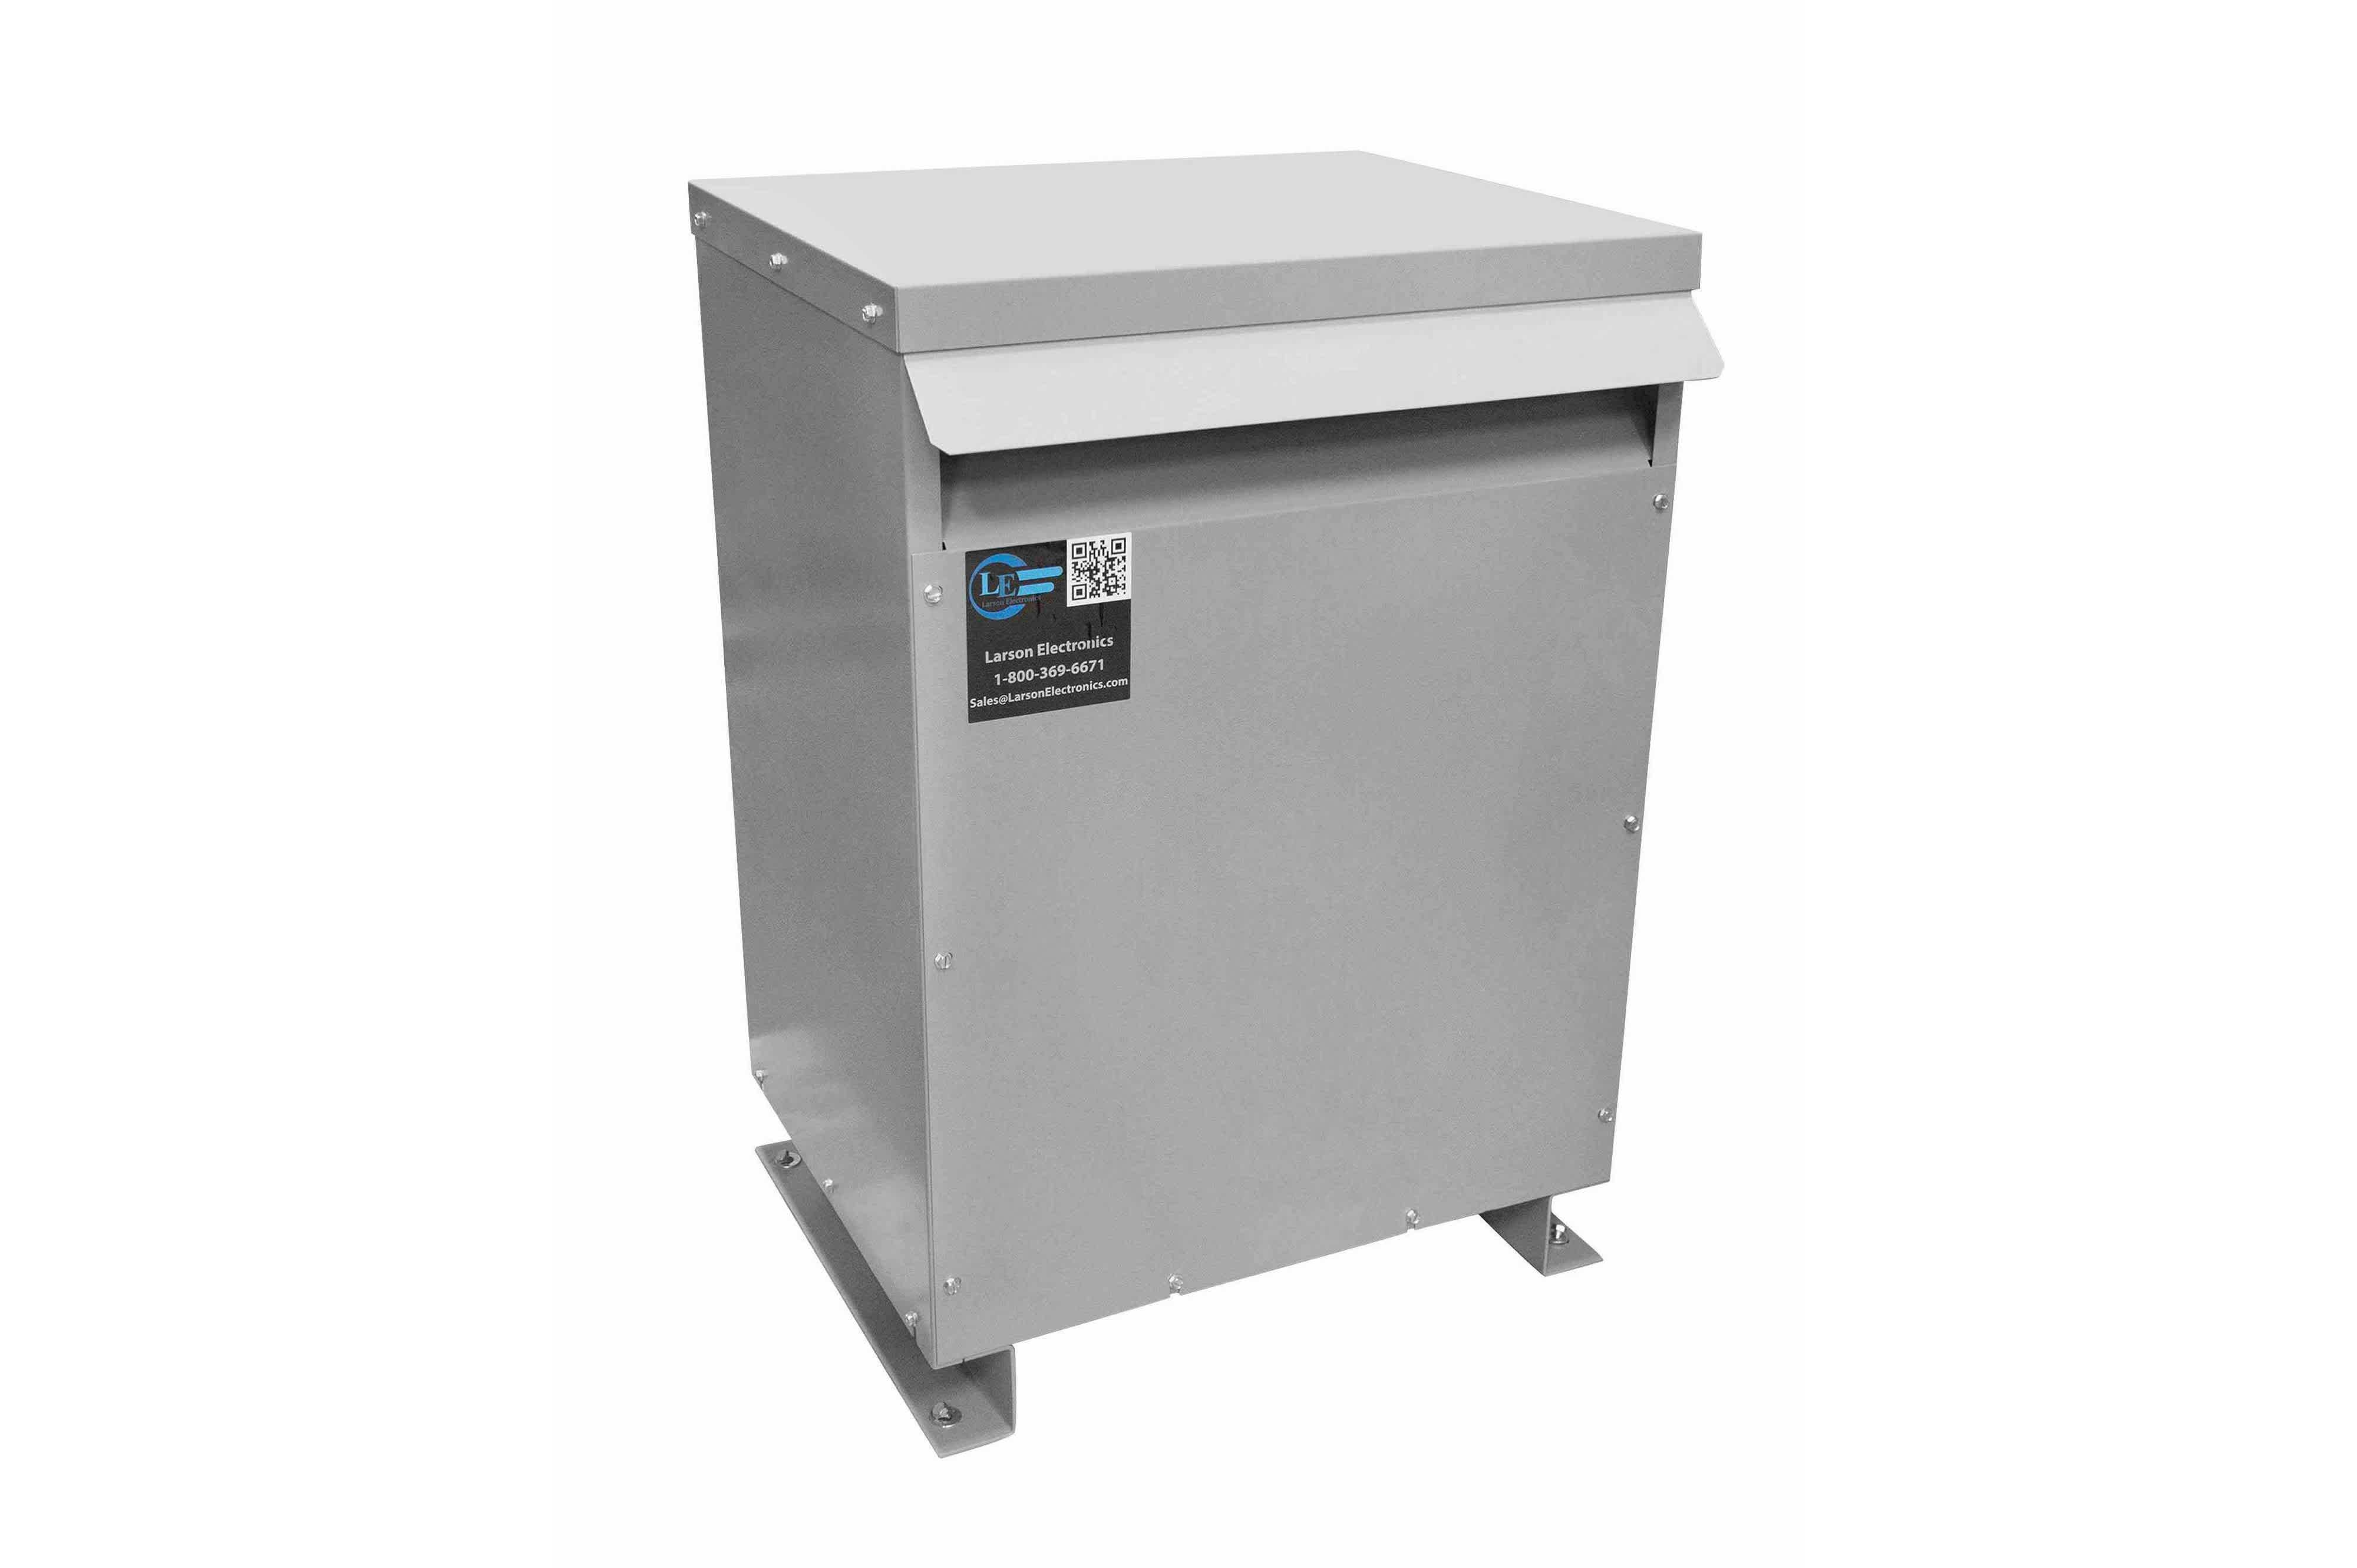 500 kVA 3PH Isolation Transformer, 415V Wye Primary, 480Y/277 Wye-N Secondary, N3R, Ventilated, 60 Hz